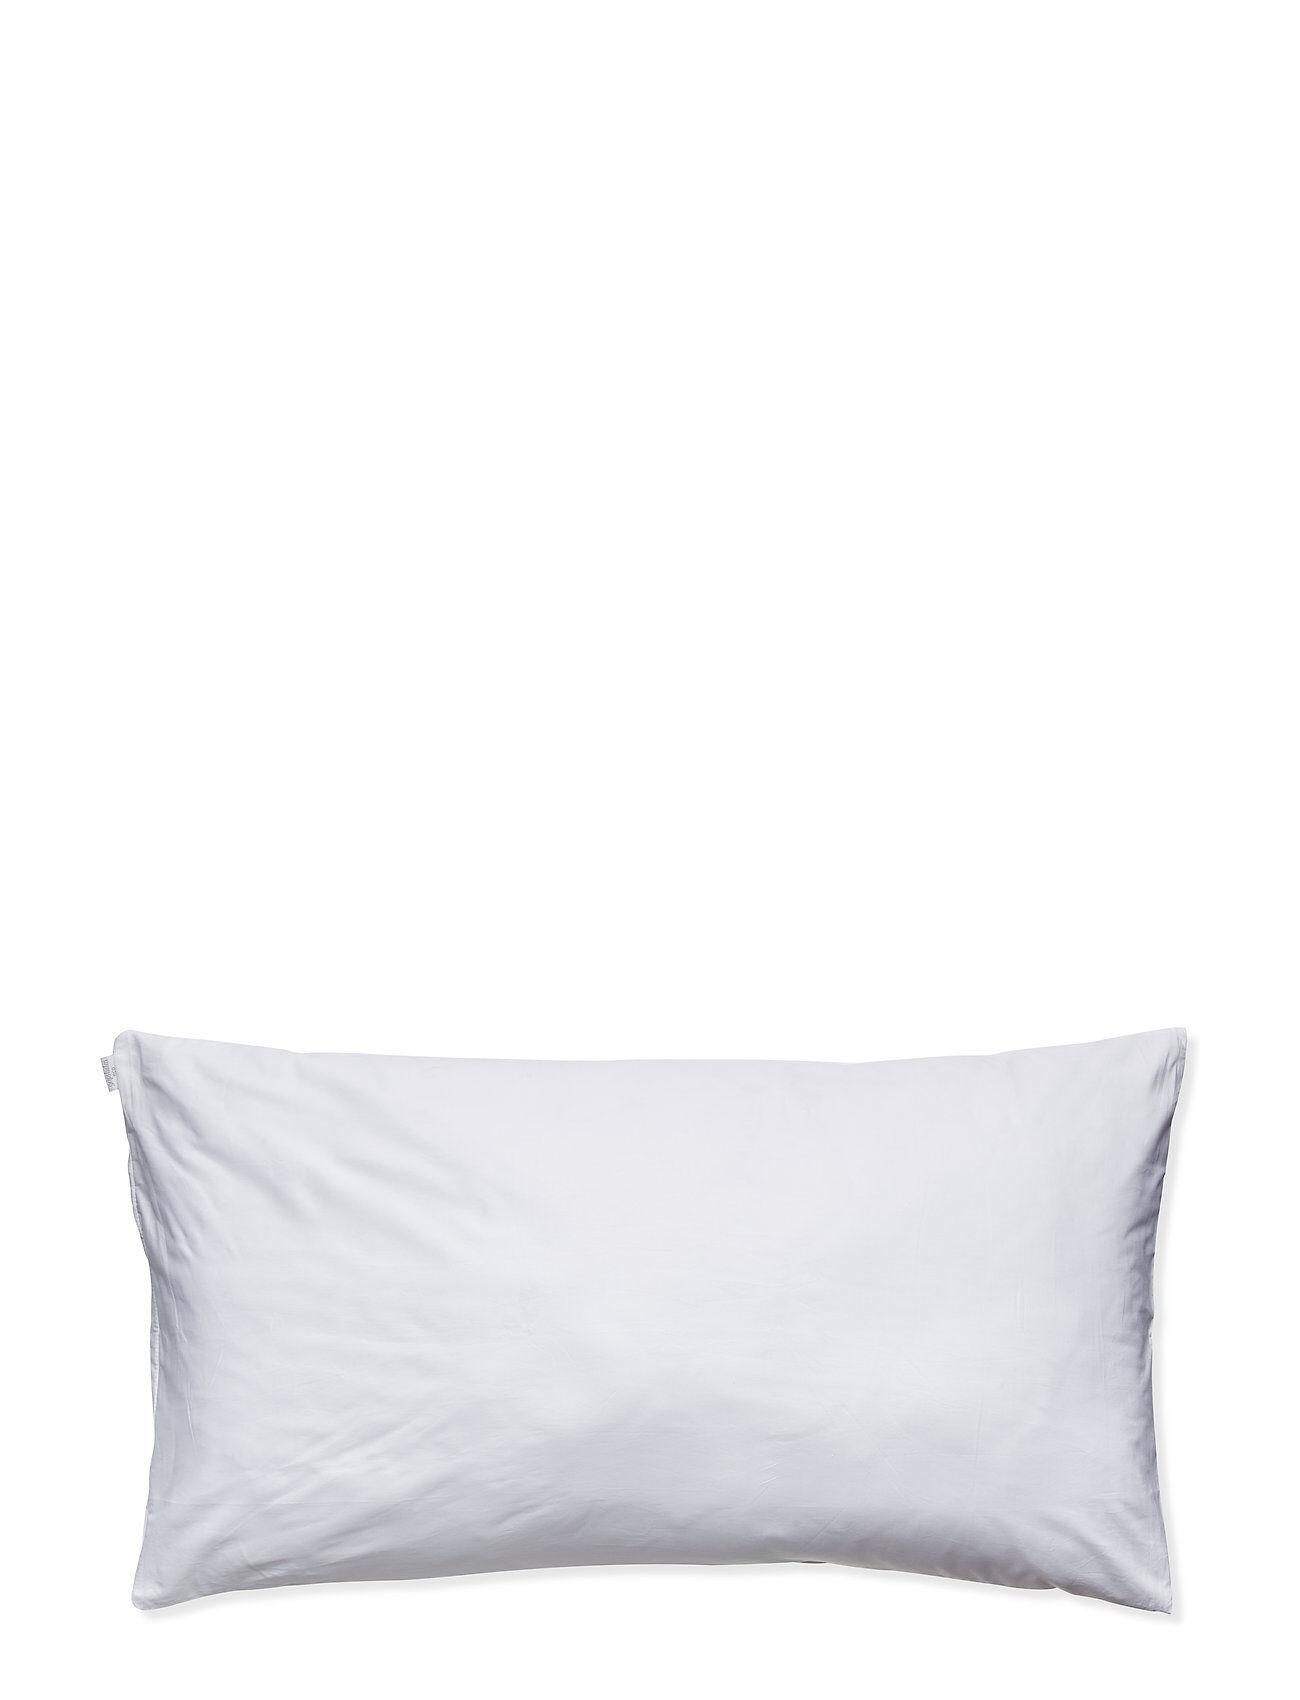 Gripsholm Pillowcase Eco Percale